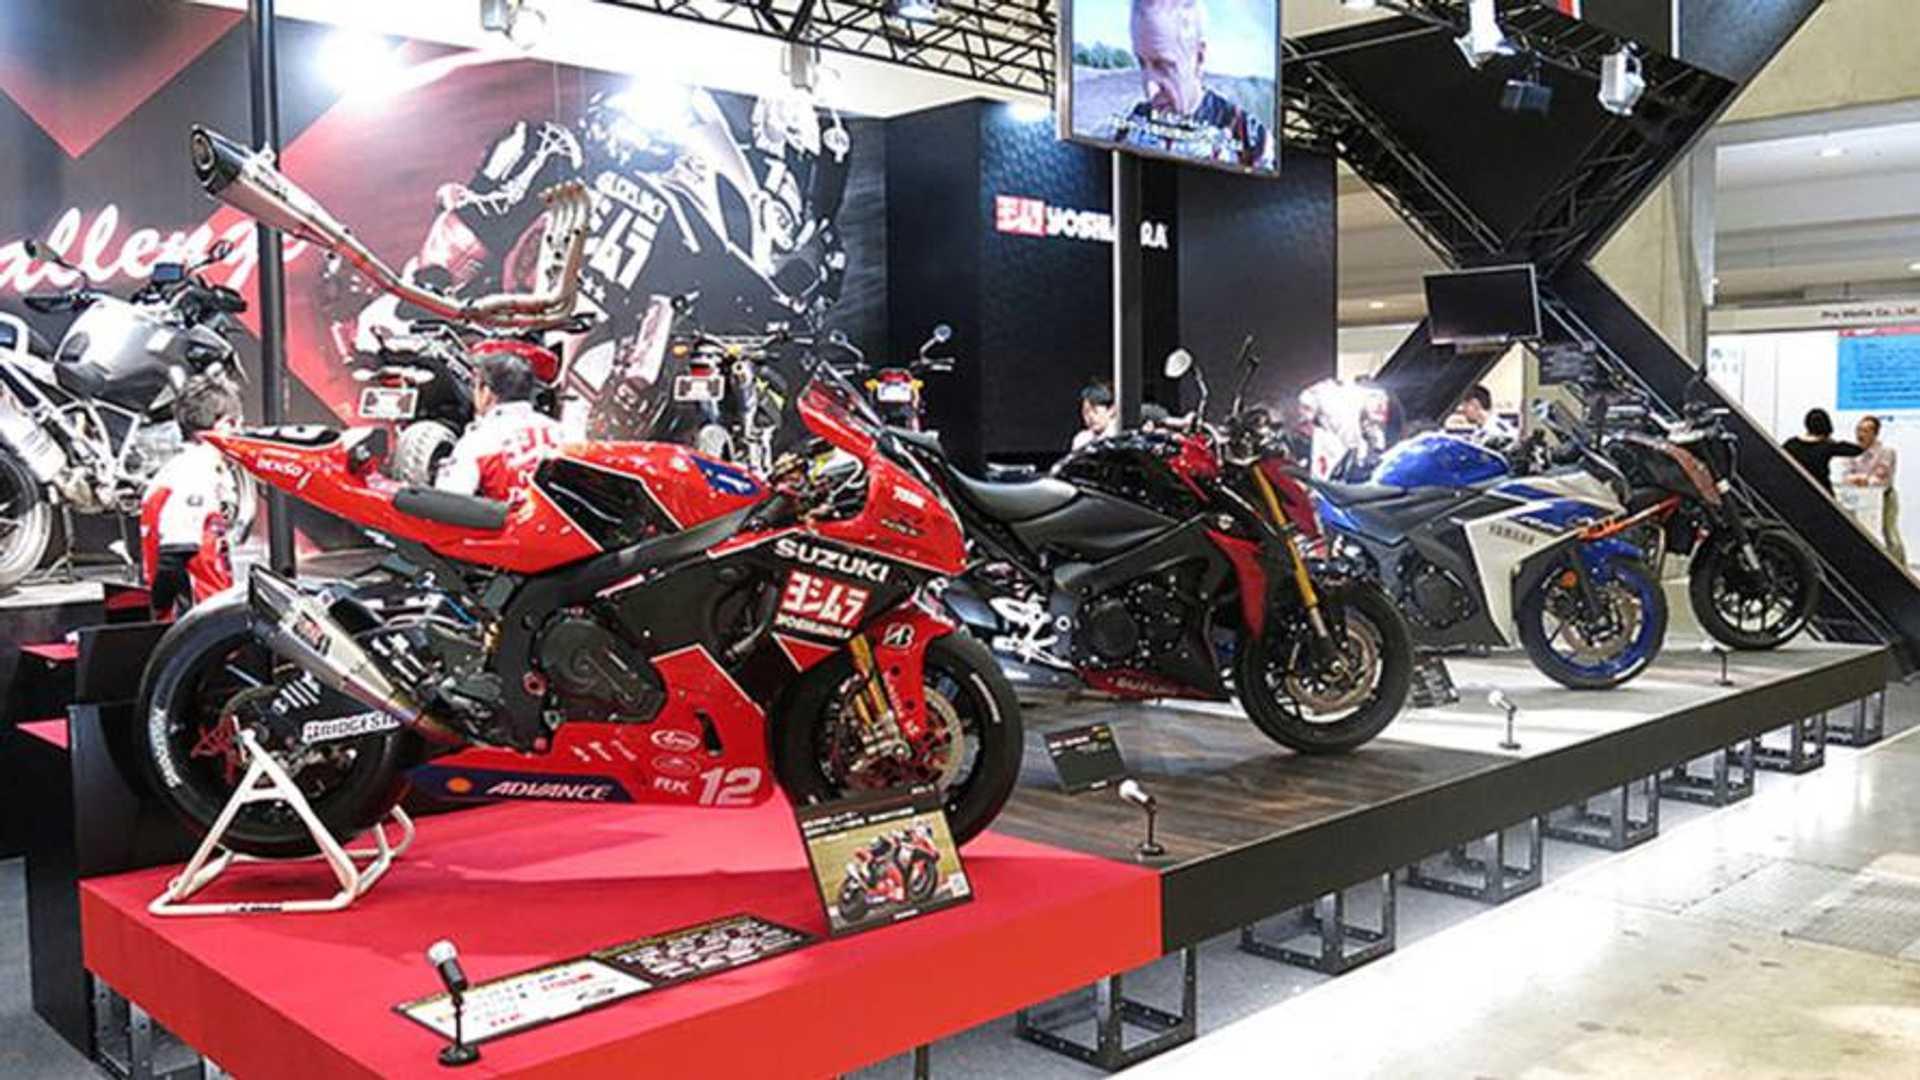 Motorcycle Sales Slump in Japan